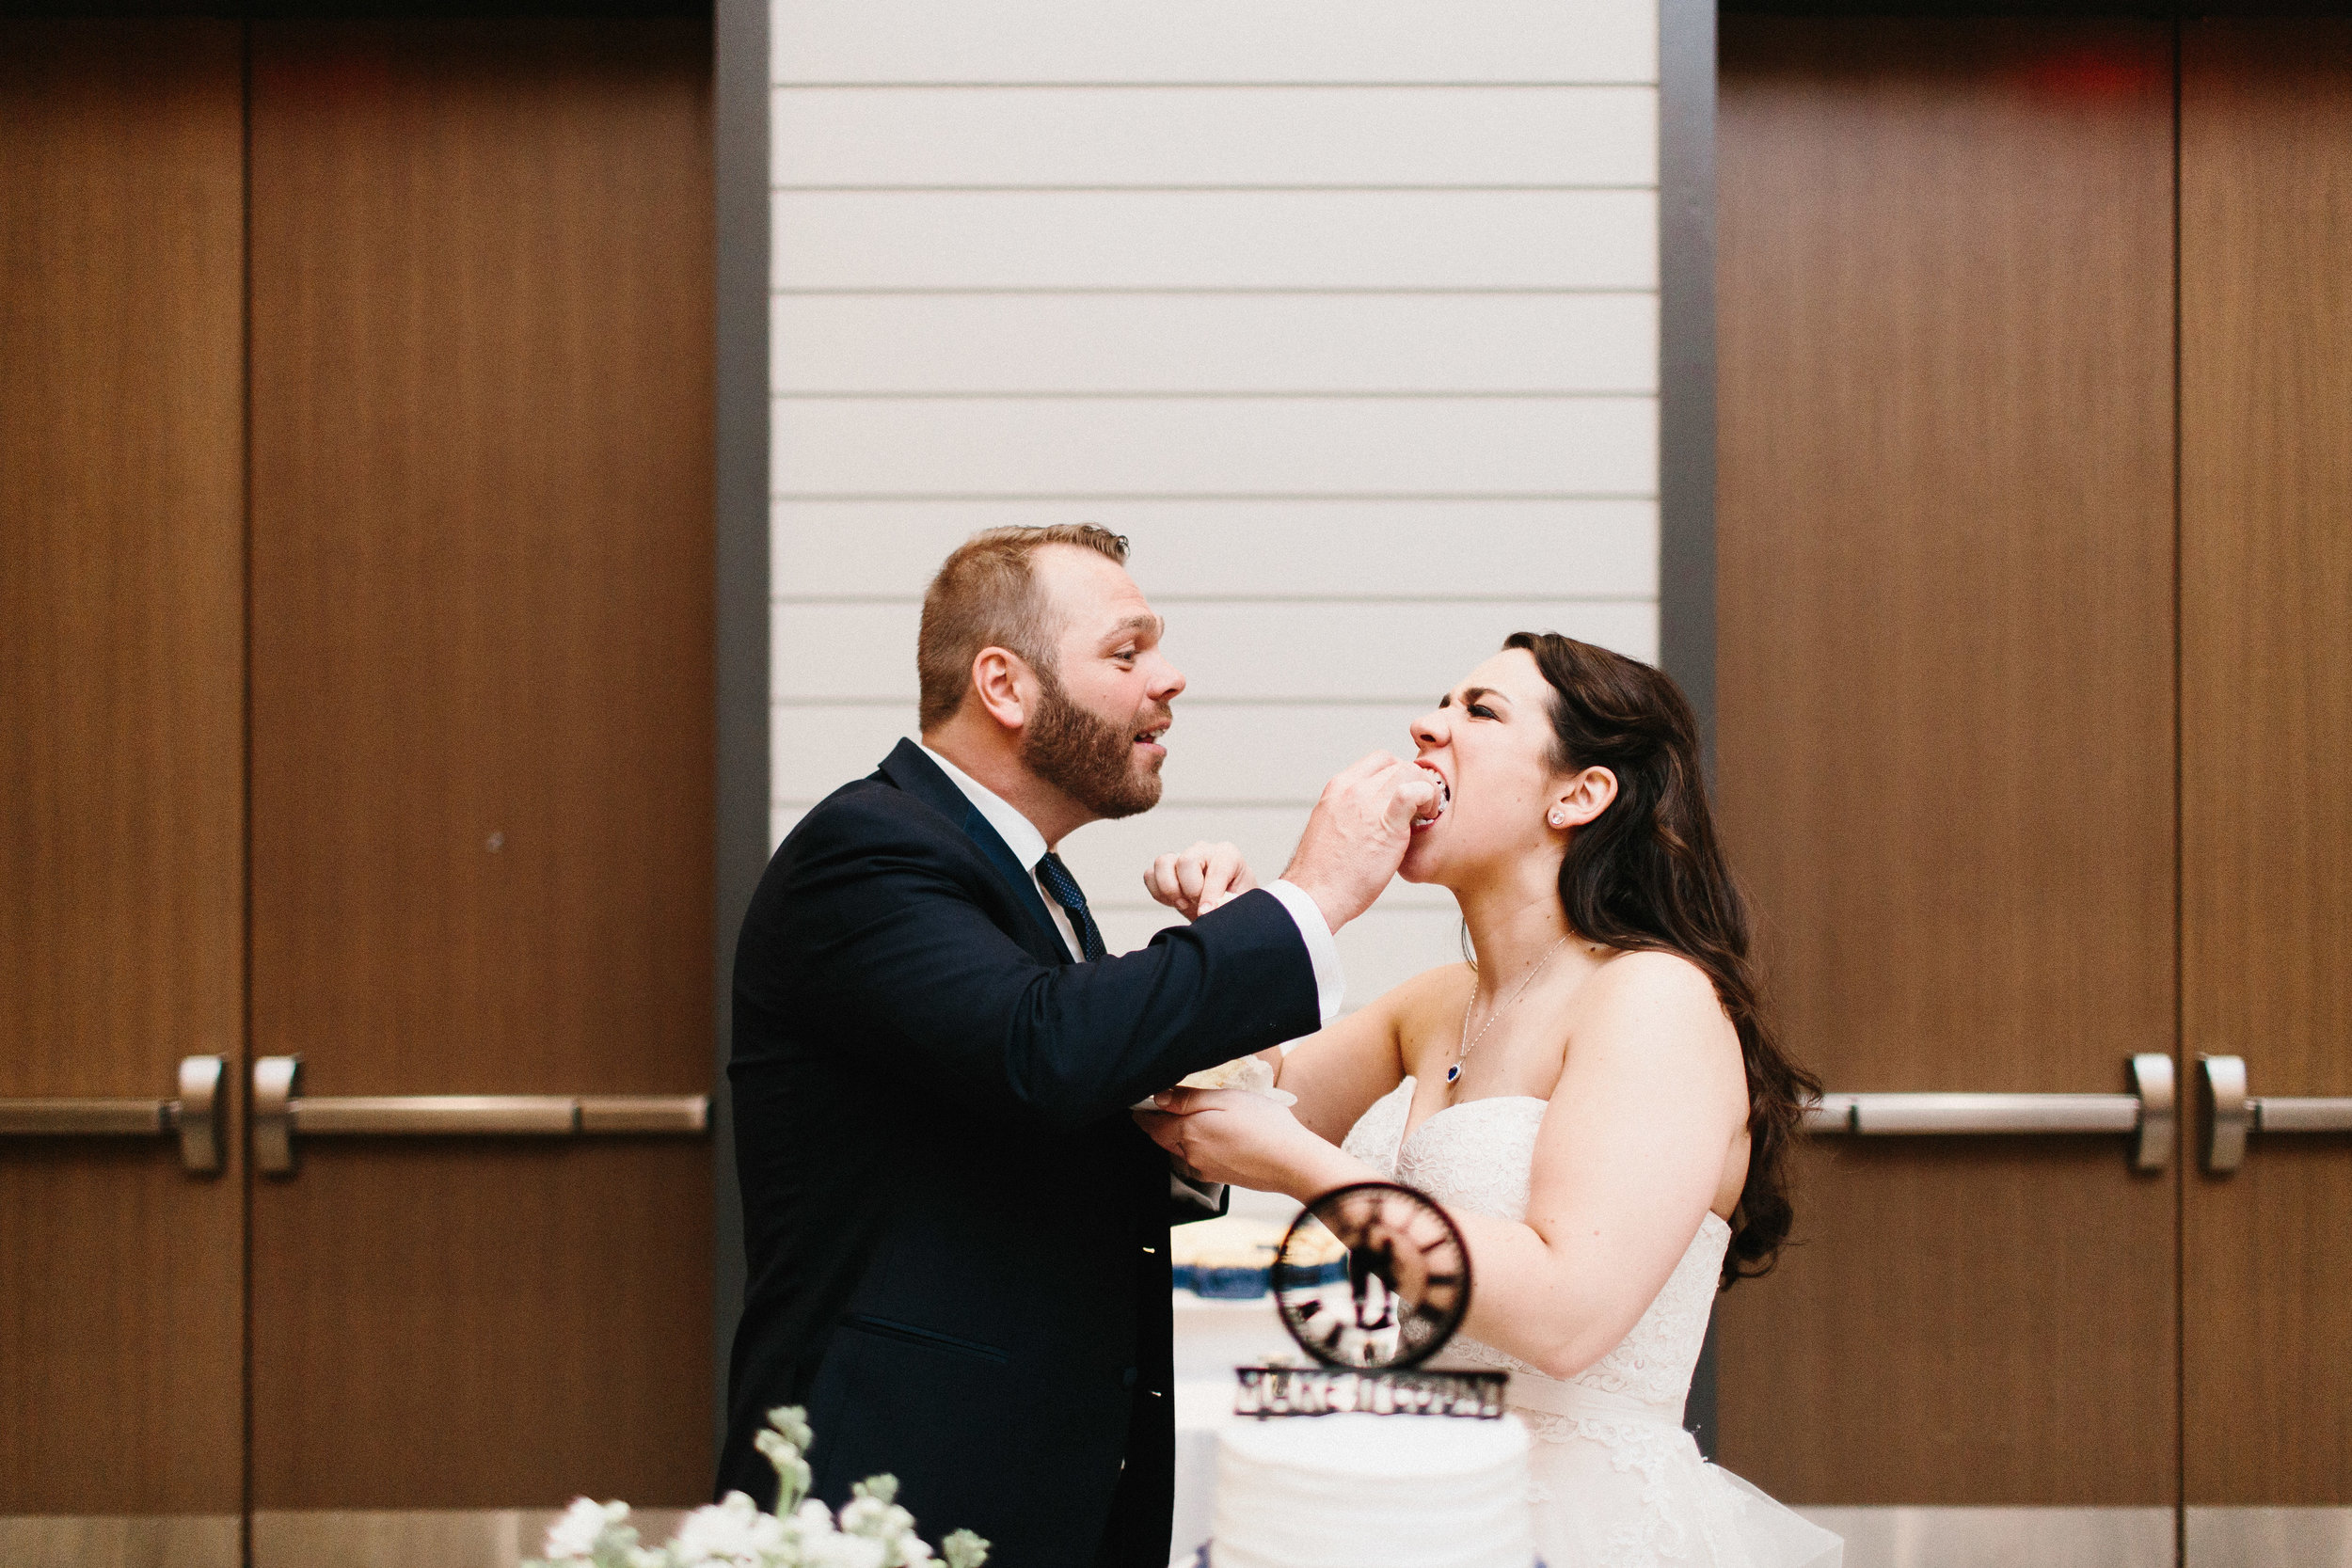 roswell_st_peter_chanel_catholic_avalon_hotel_alpharetta_wedding-2114.jpg